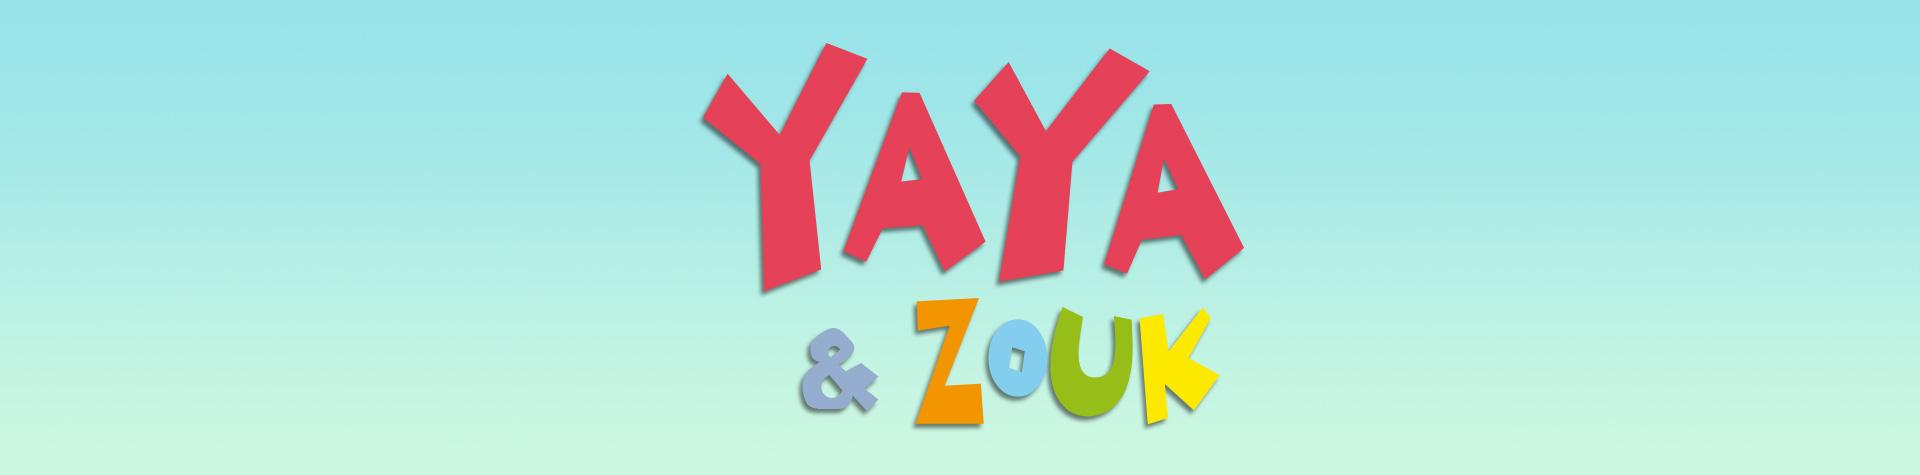 LogoYaya2